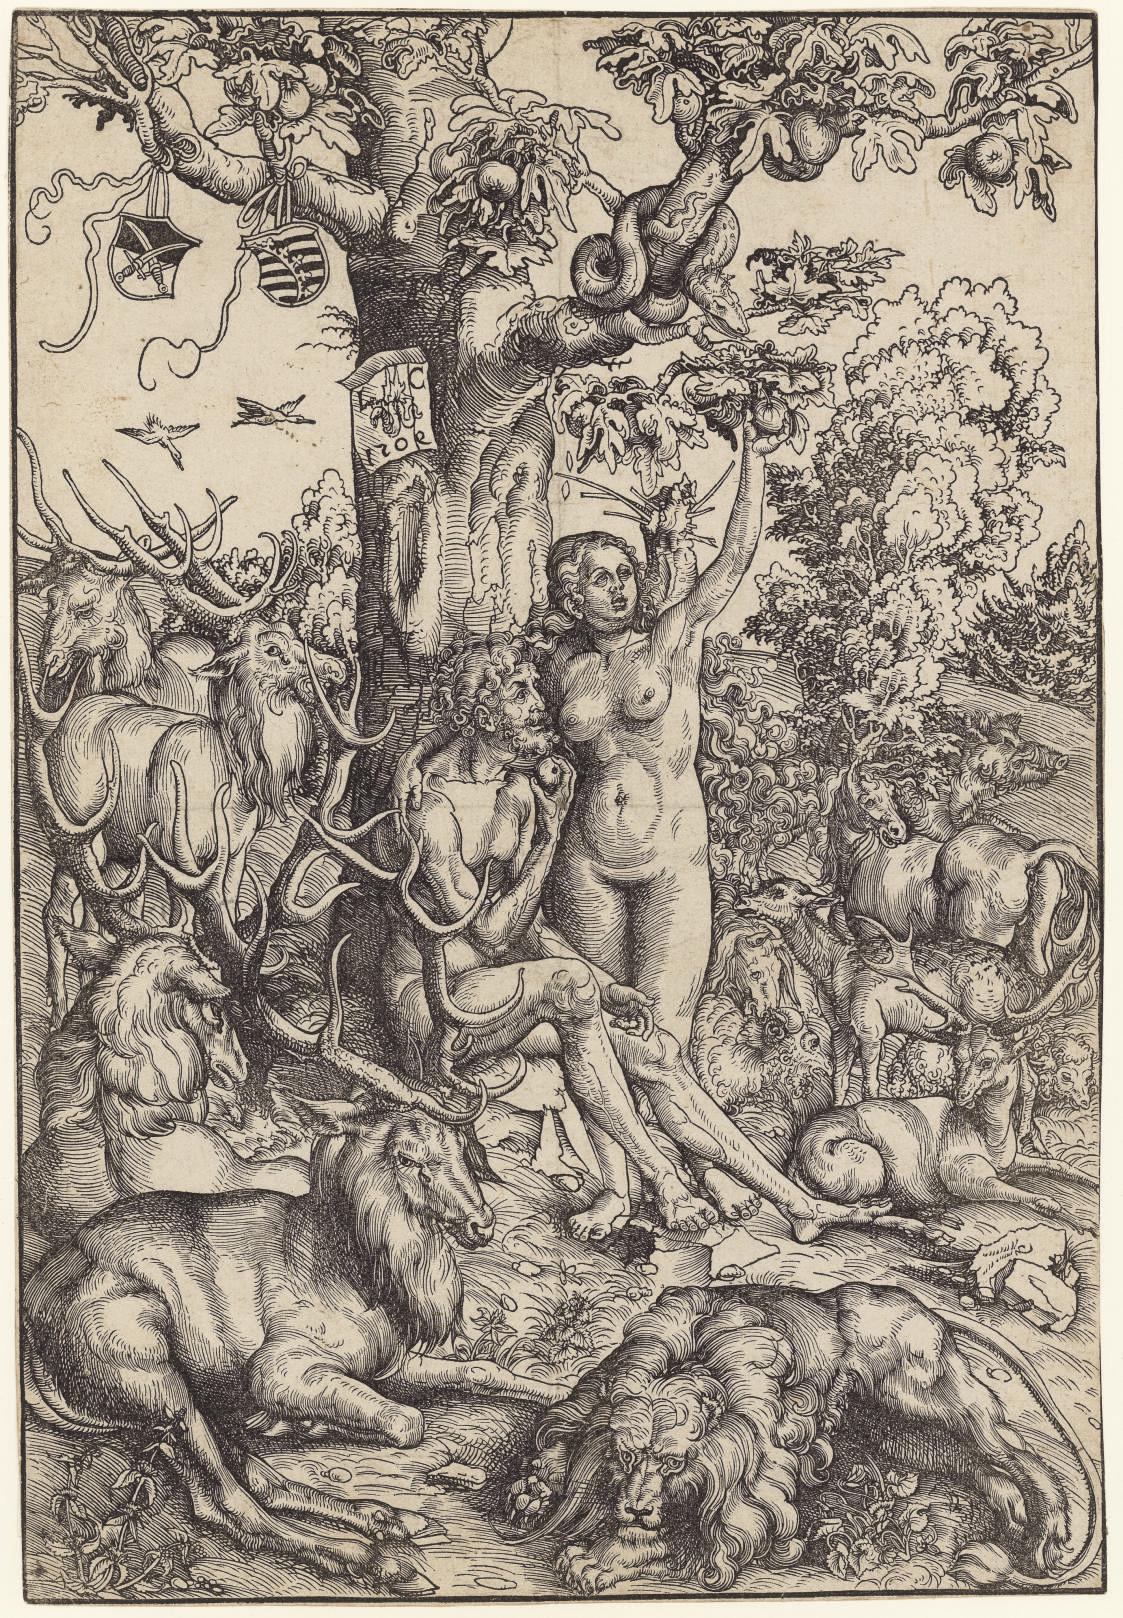 Lucas Cranach the Elder (1472-